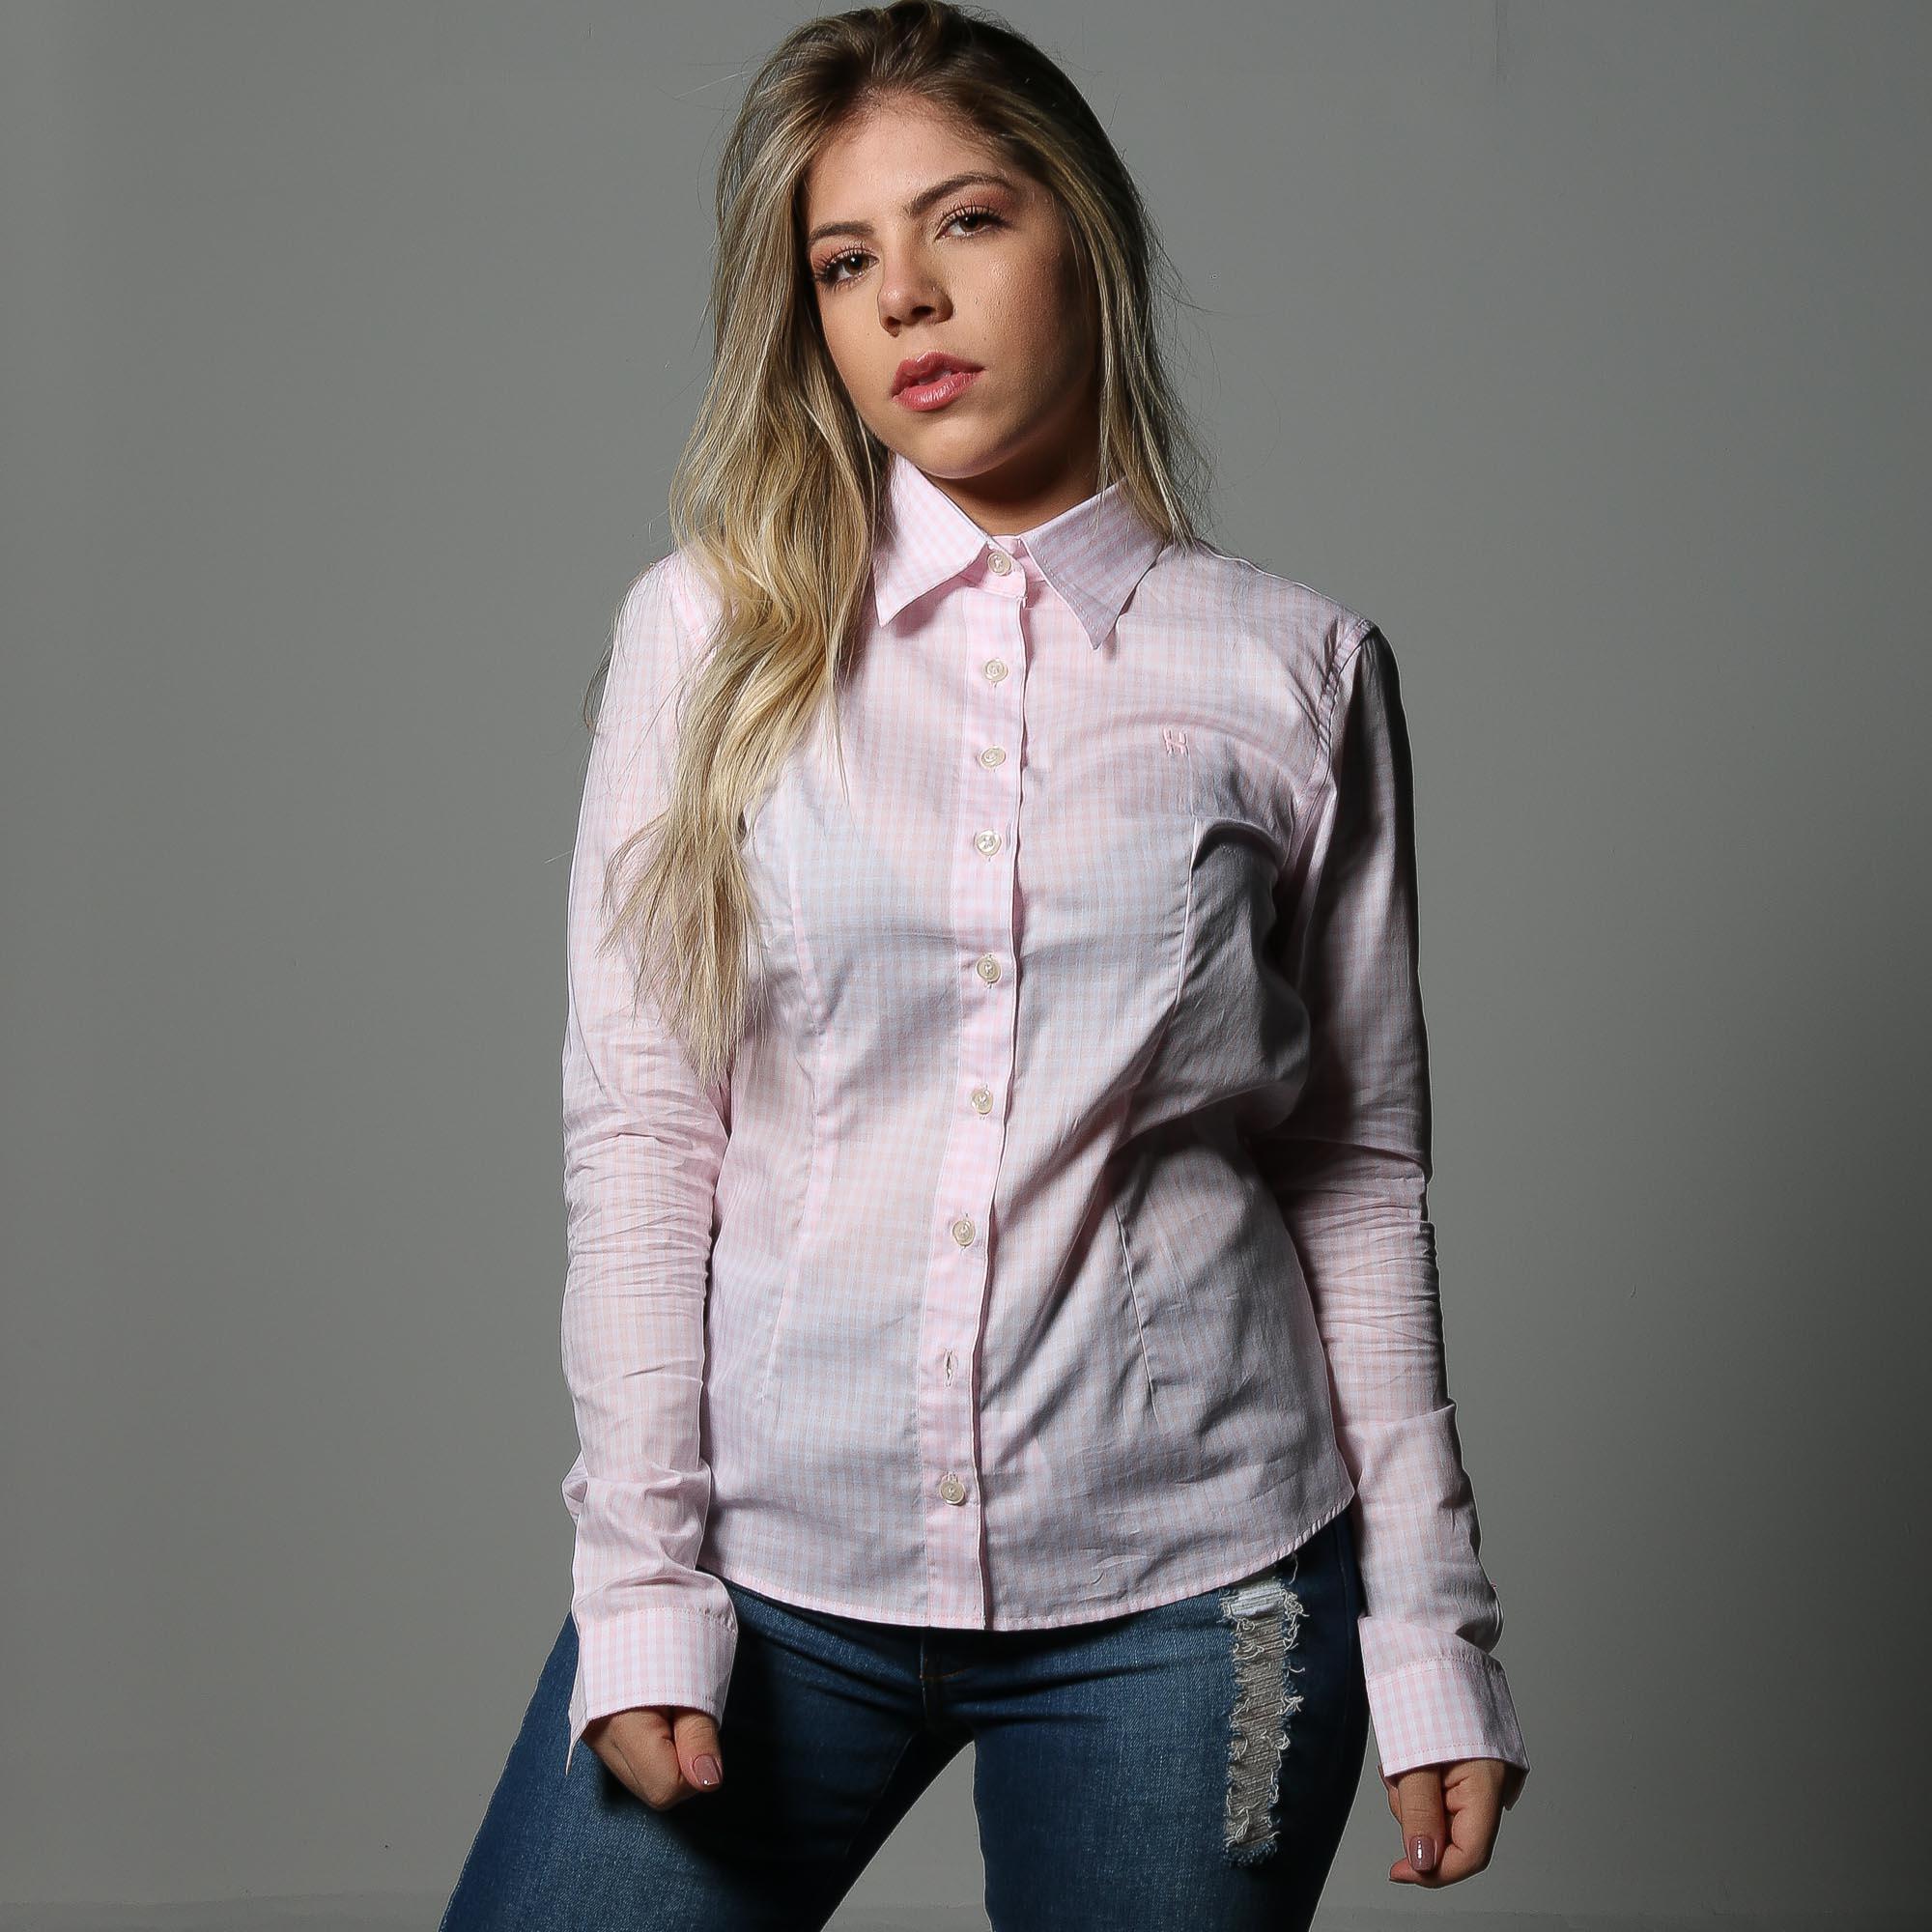 Camisa Feminina TXC 12036